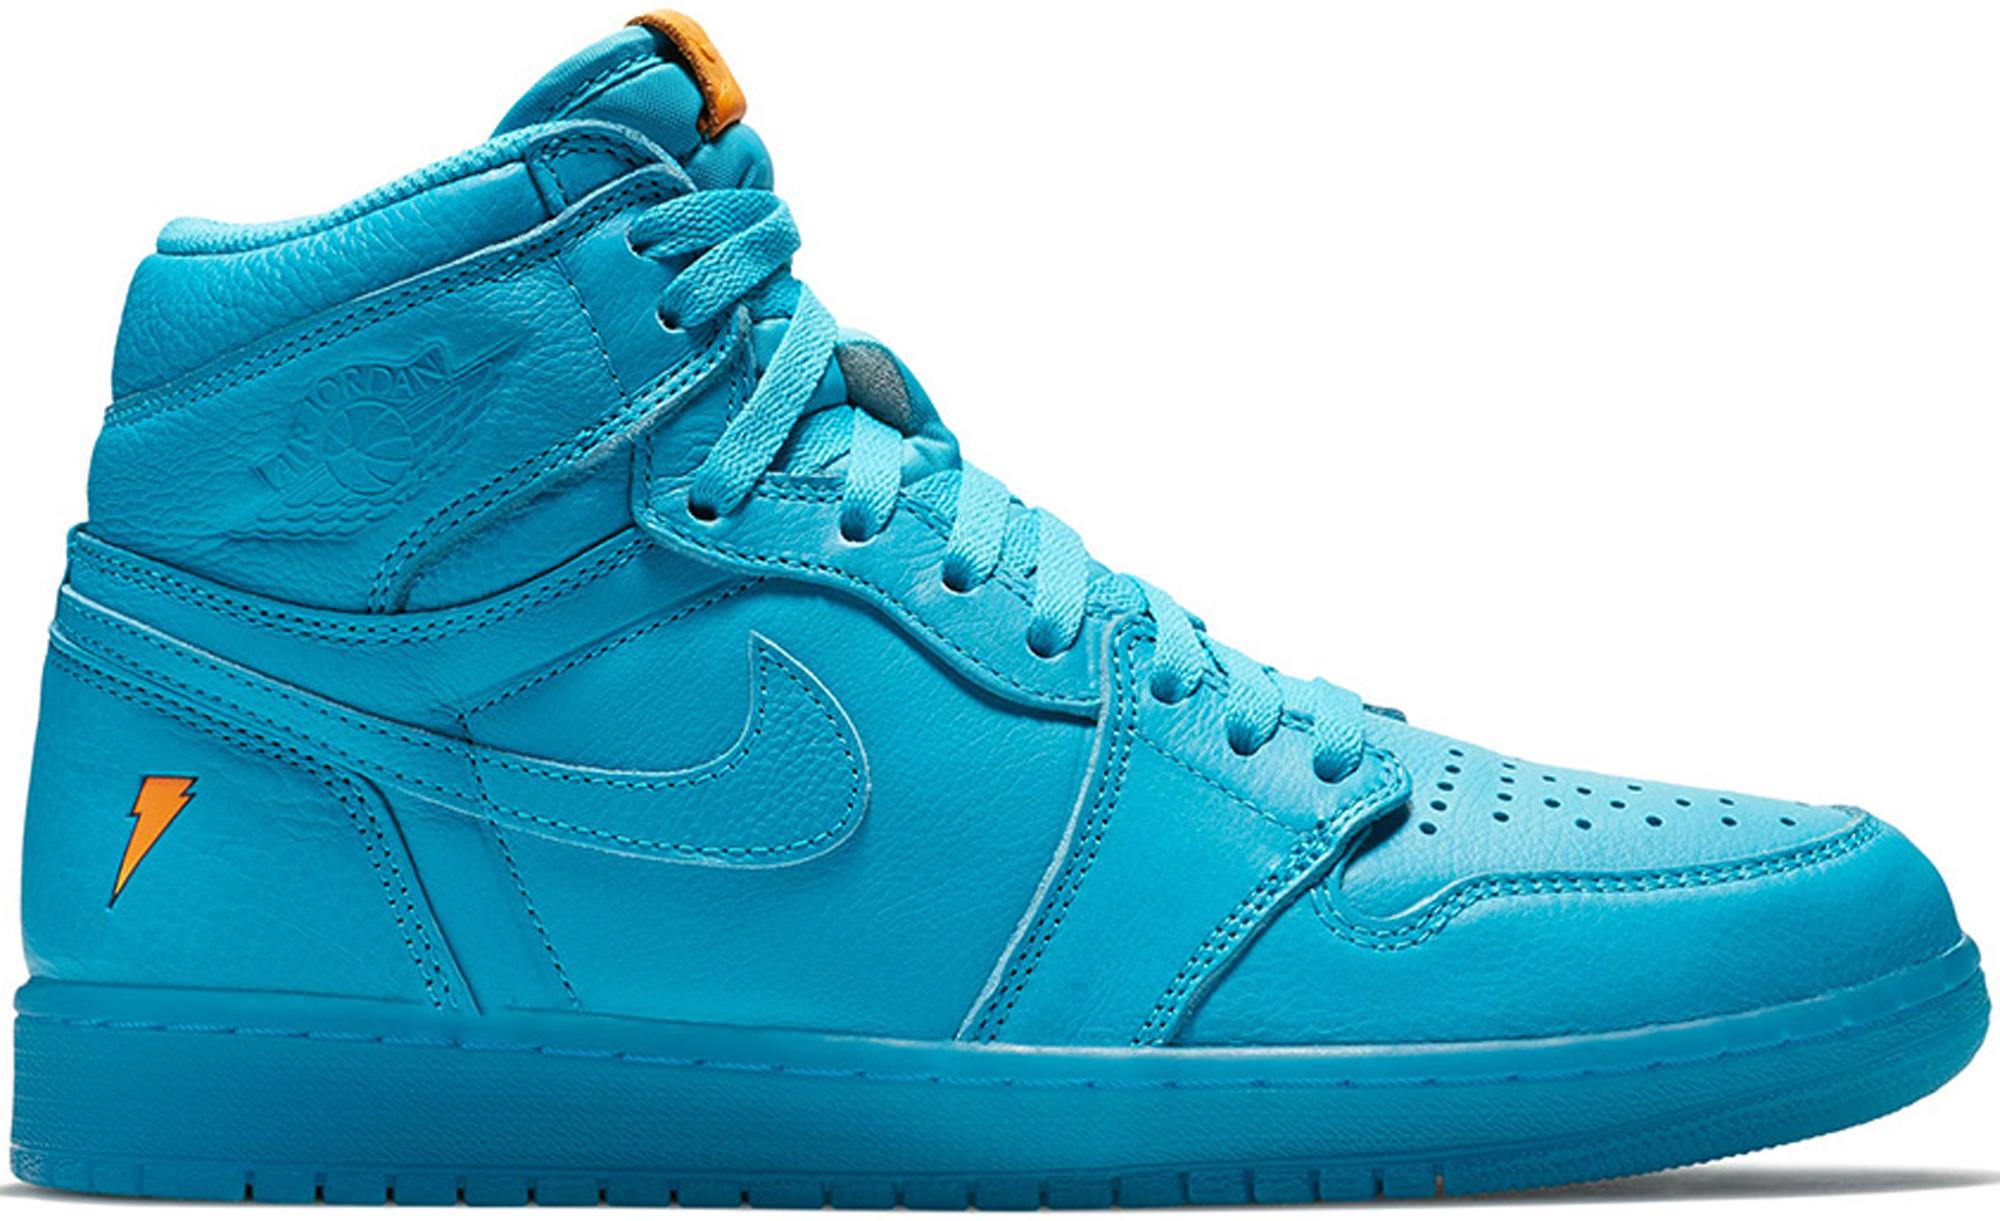 Jordan 1 Retro High Gatorade Blue